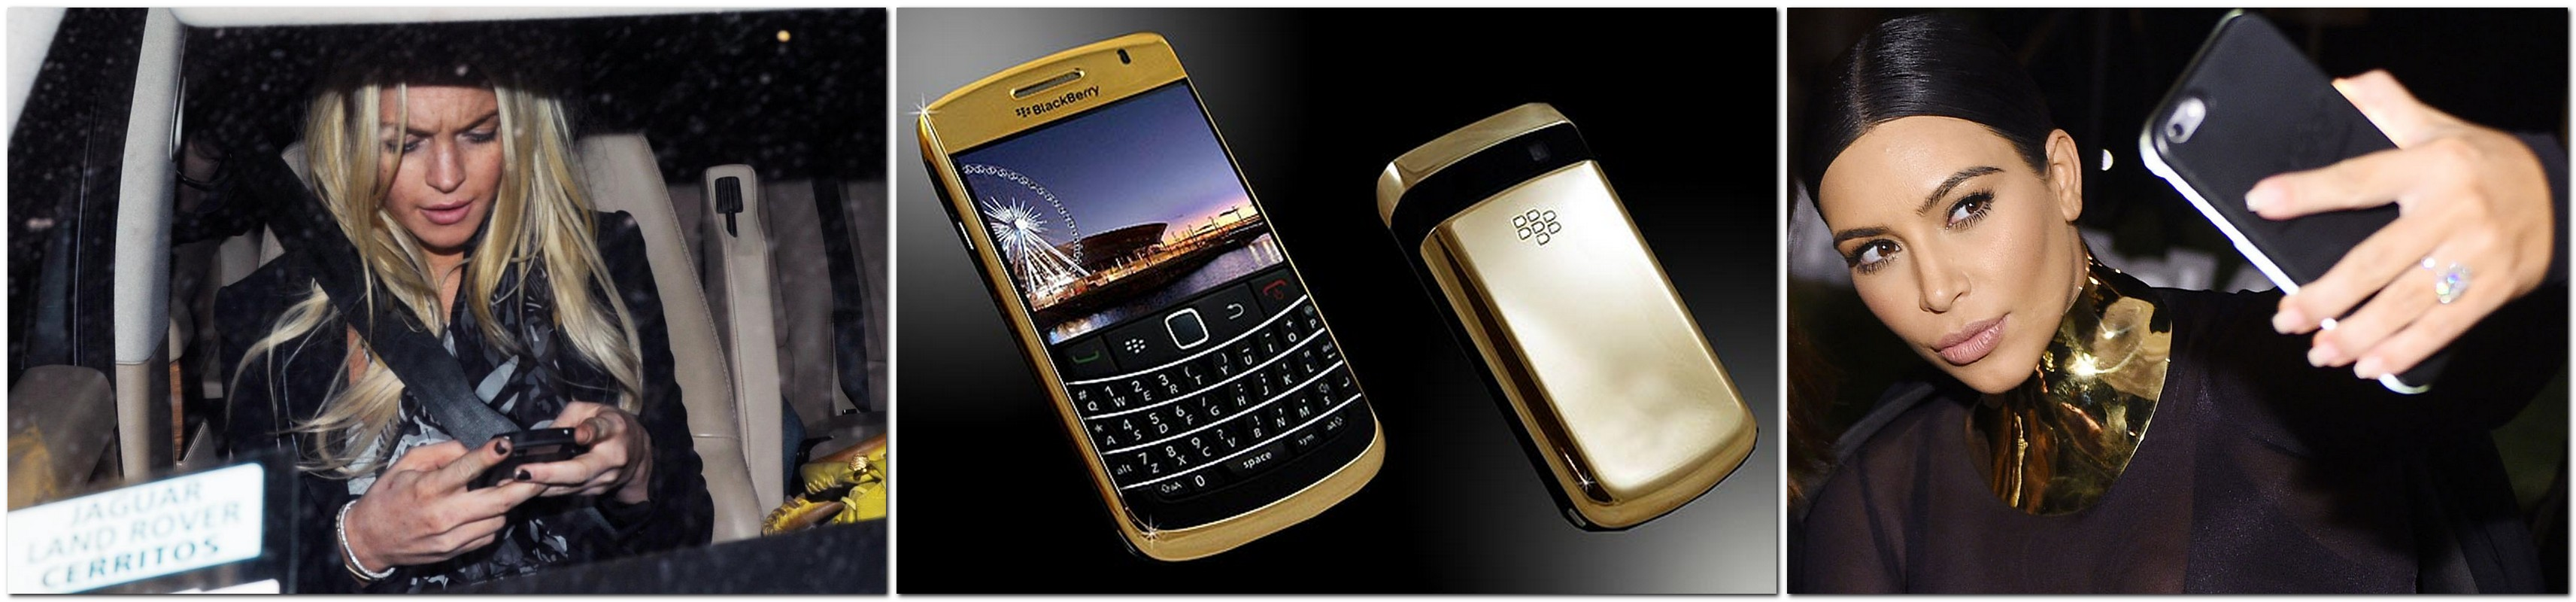 Stars, prefers Blackberry